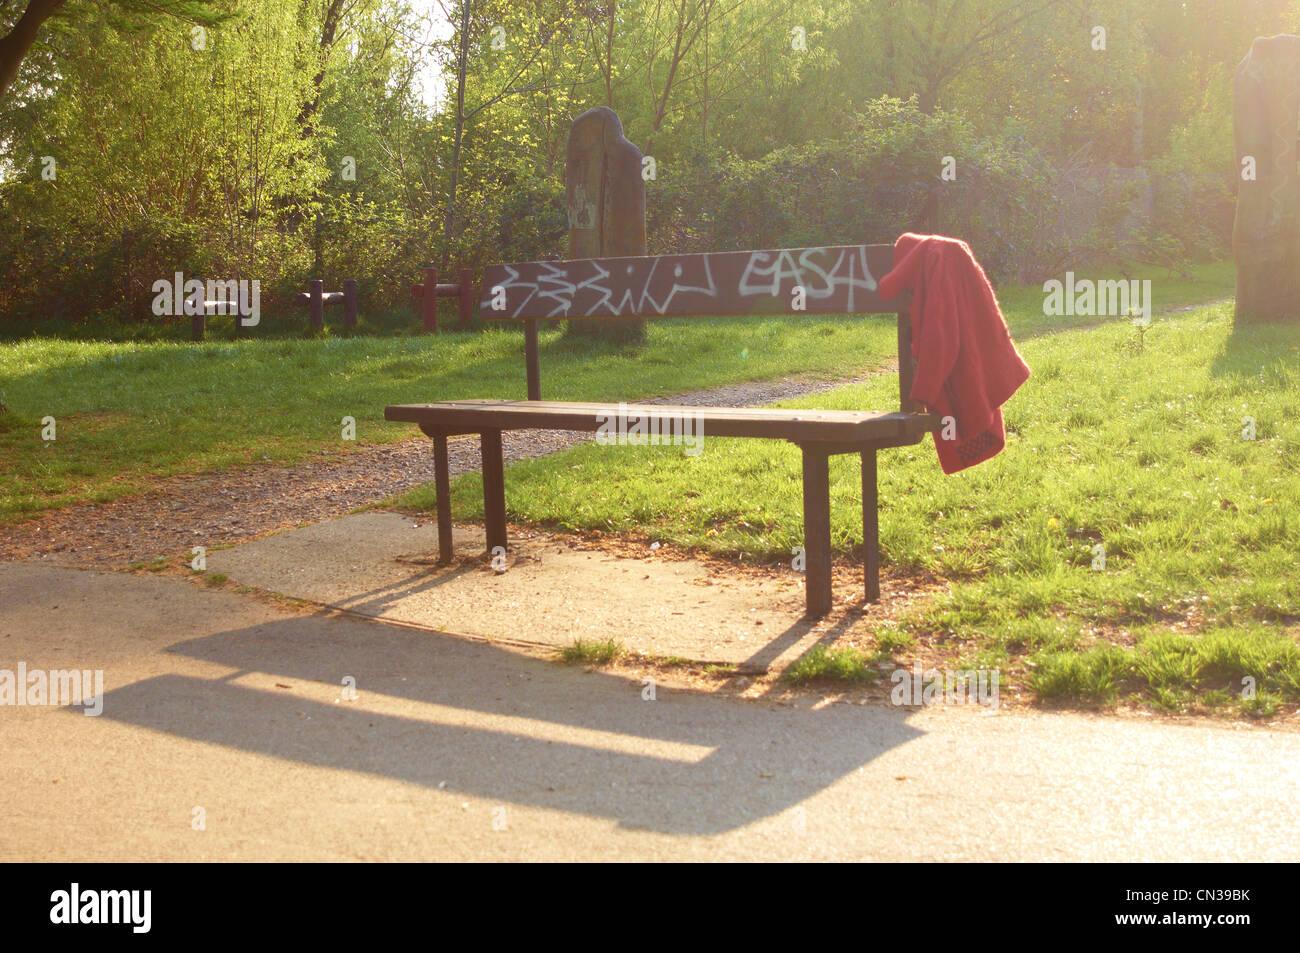 Verlorene Jacke auf einer Parkbank Stockbild